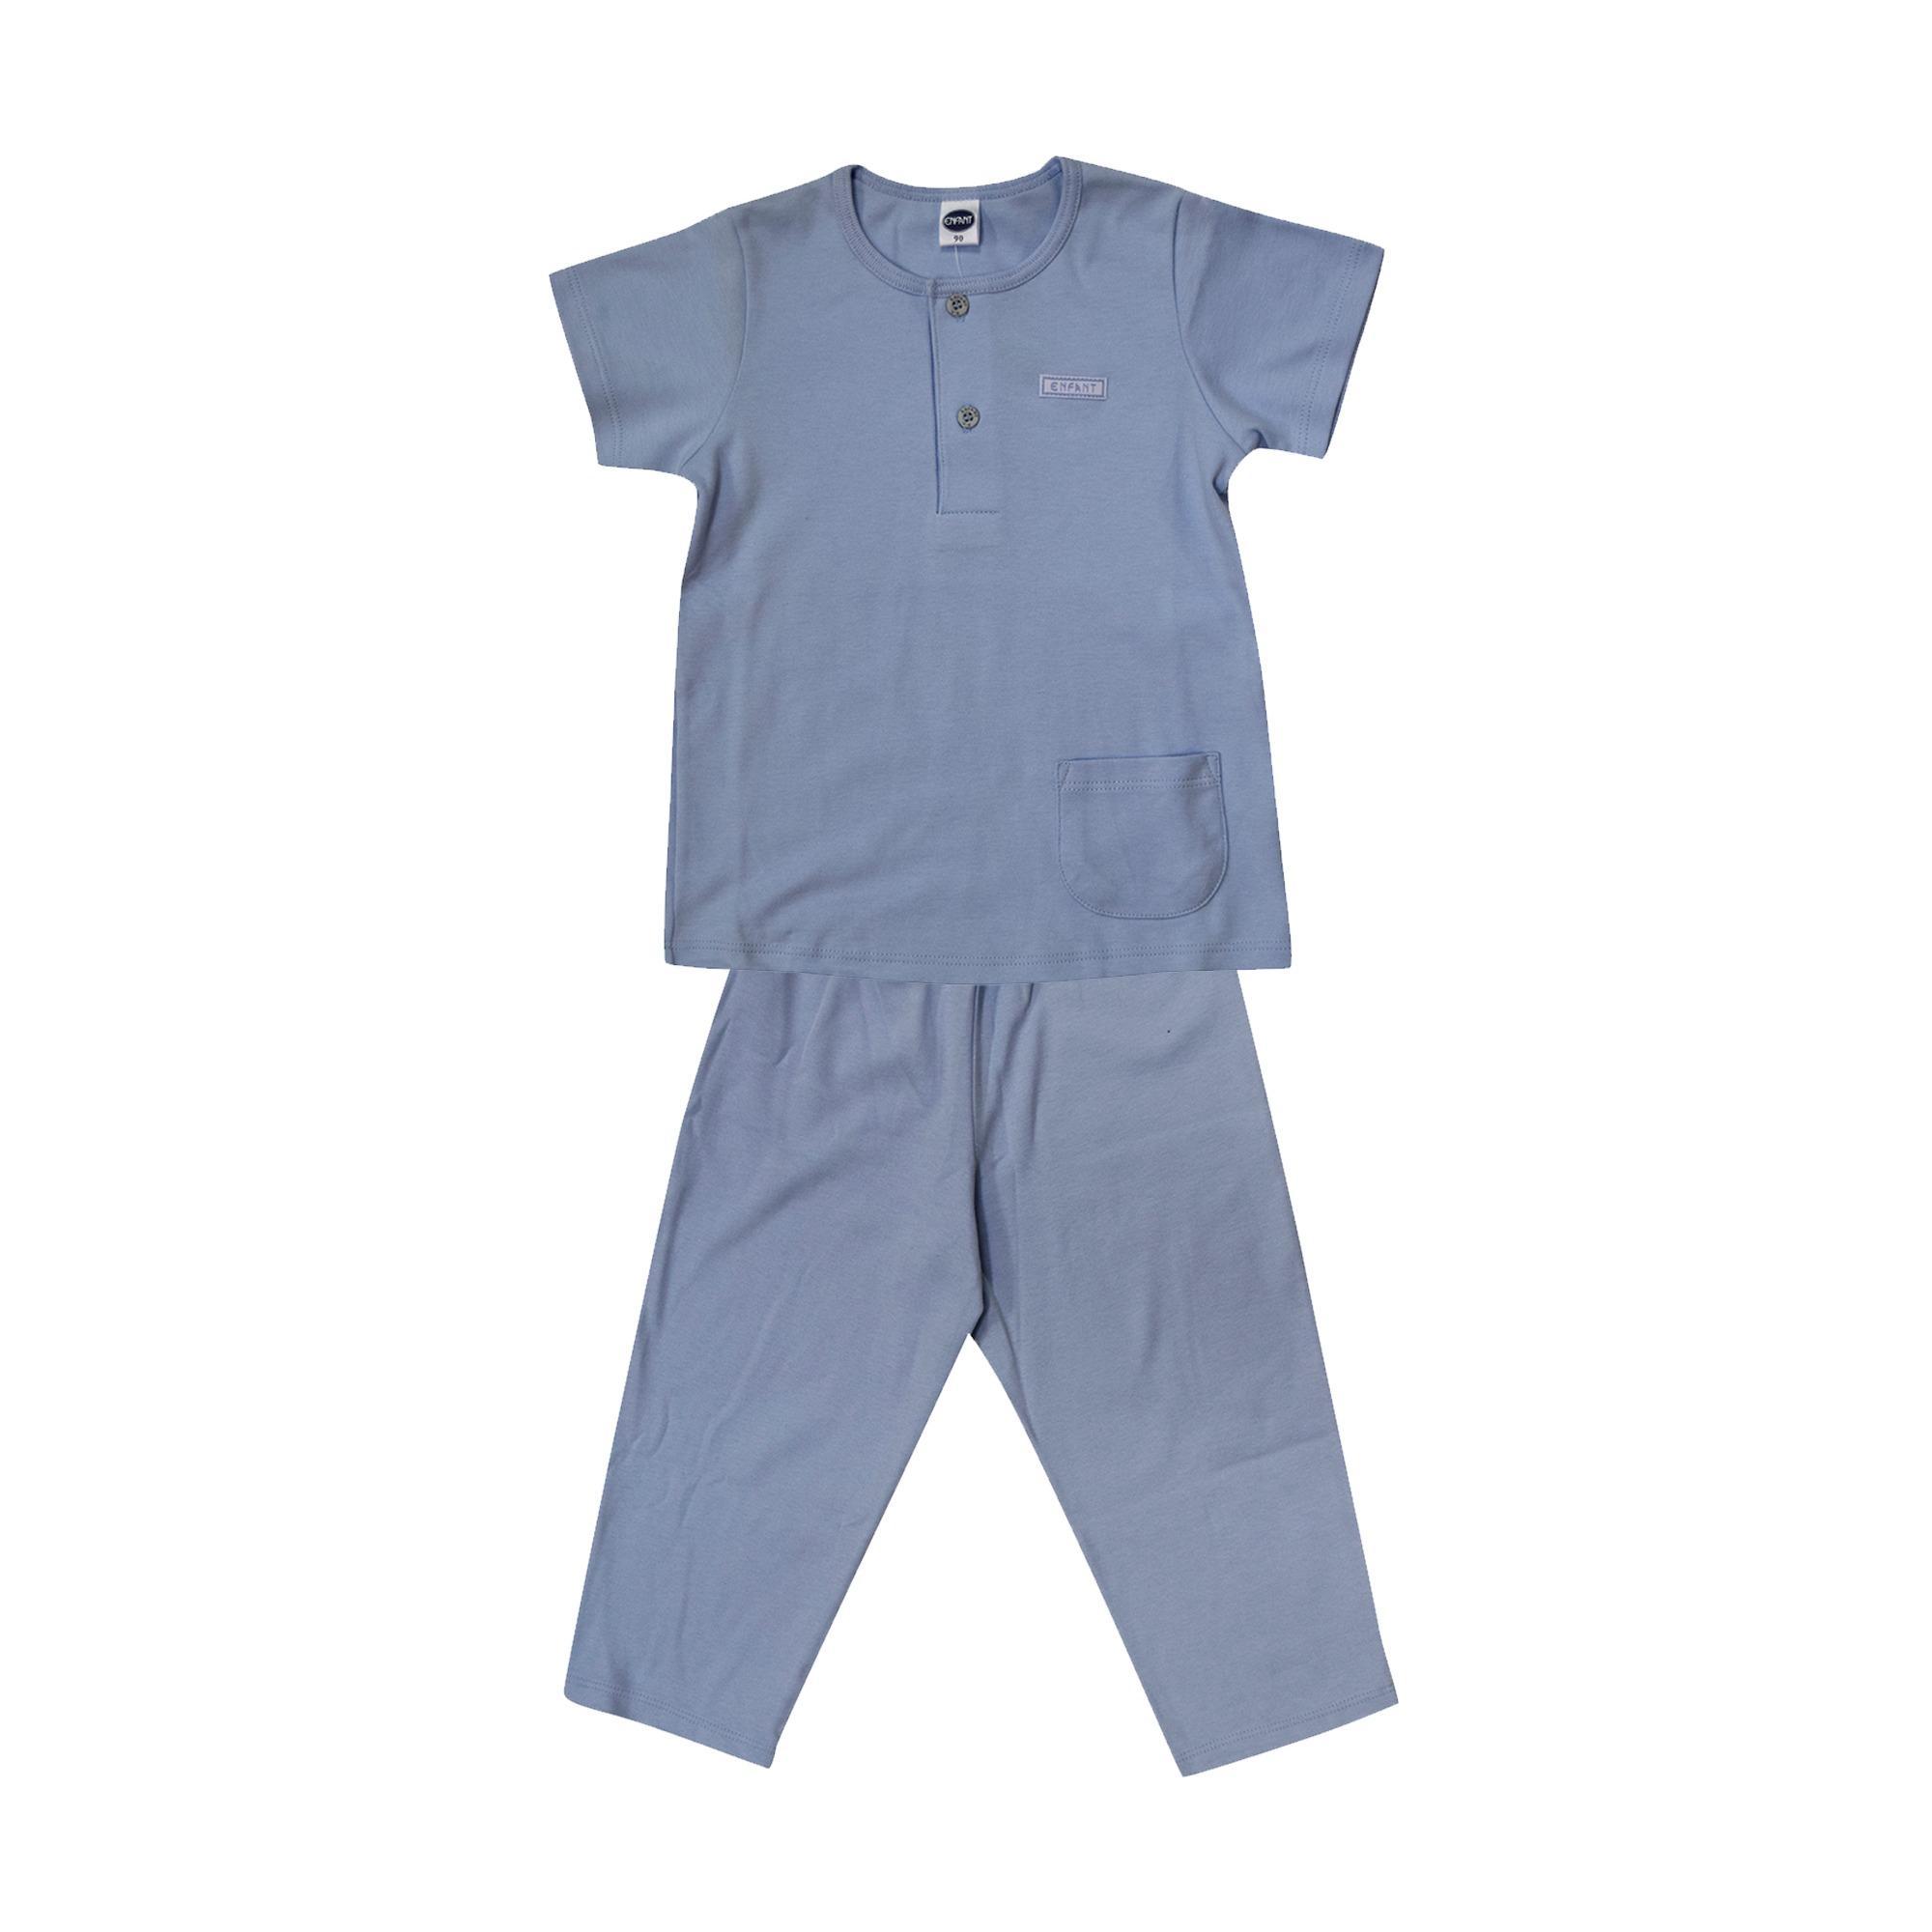 Boys Pajama Sets for sale - Kids Pajamas for Boys online brands ...